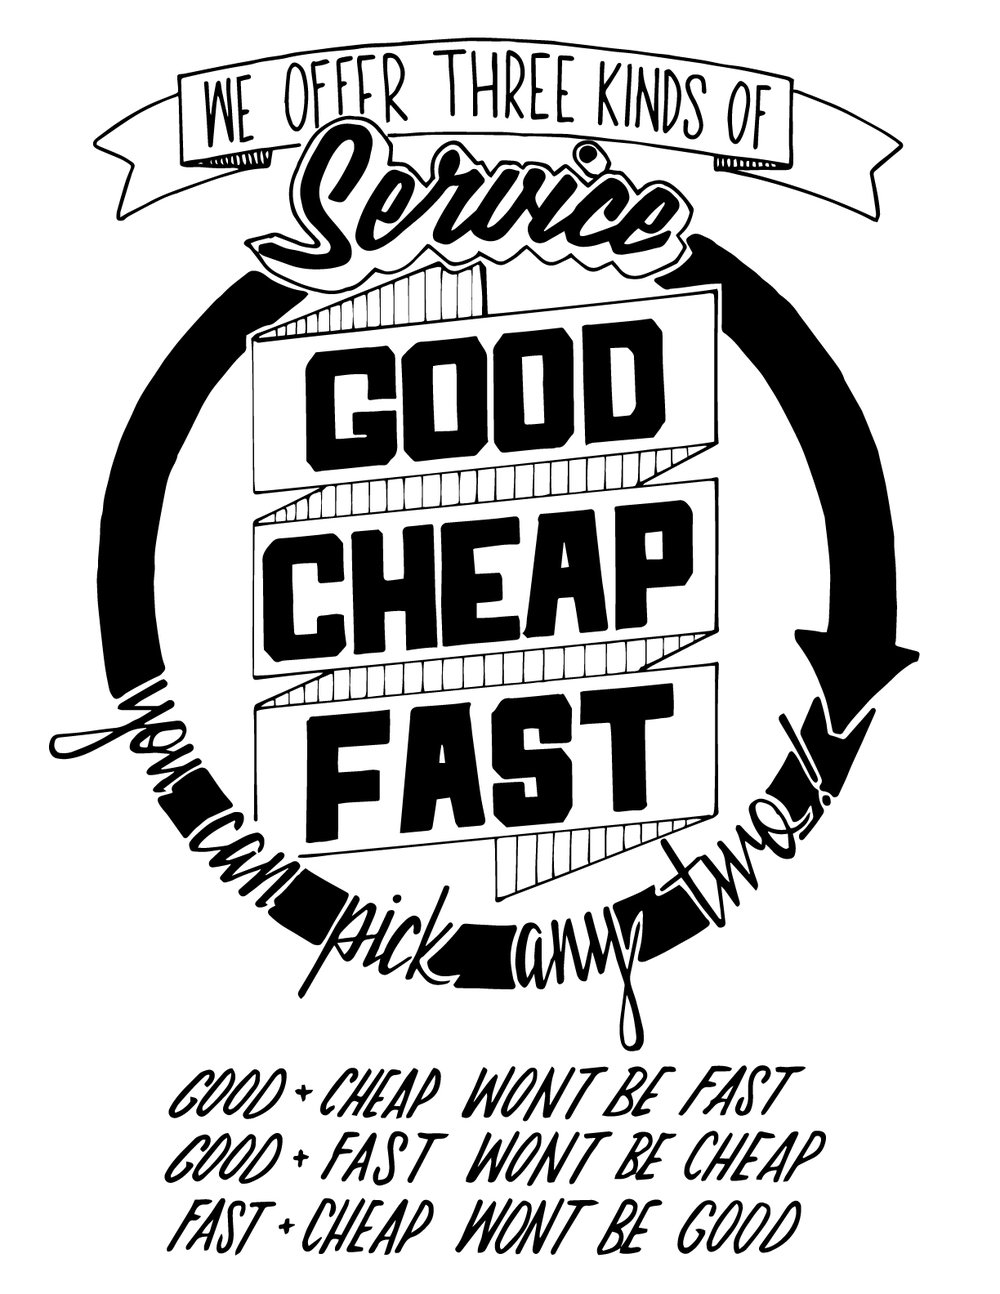 three kinds of service.jpg